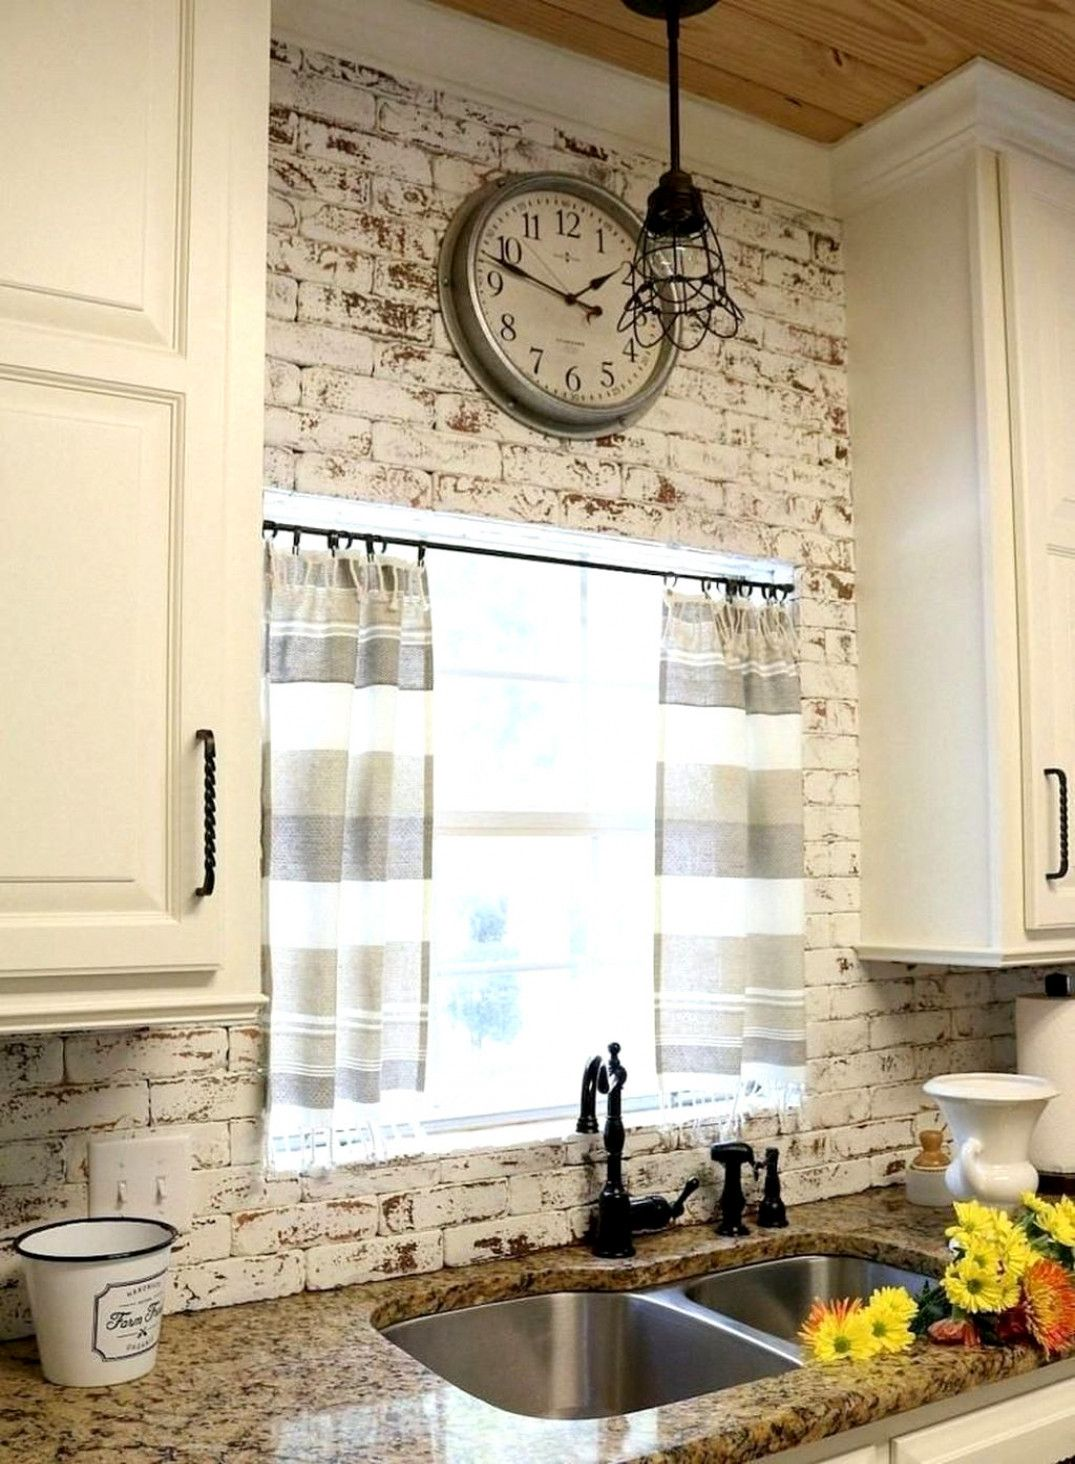 Cute Farmhouse Kitchen Backsplash Ideas 42 Whitekitchen Rustic Kitchen Backsplash Rustic Farmhouse Kitchen Rustic Kitchen